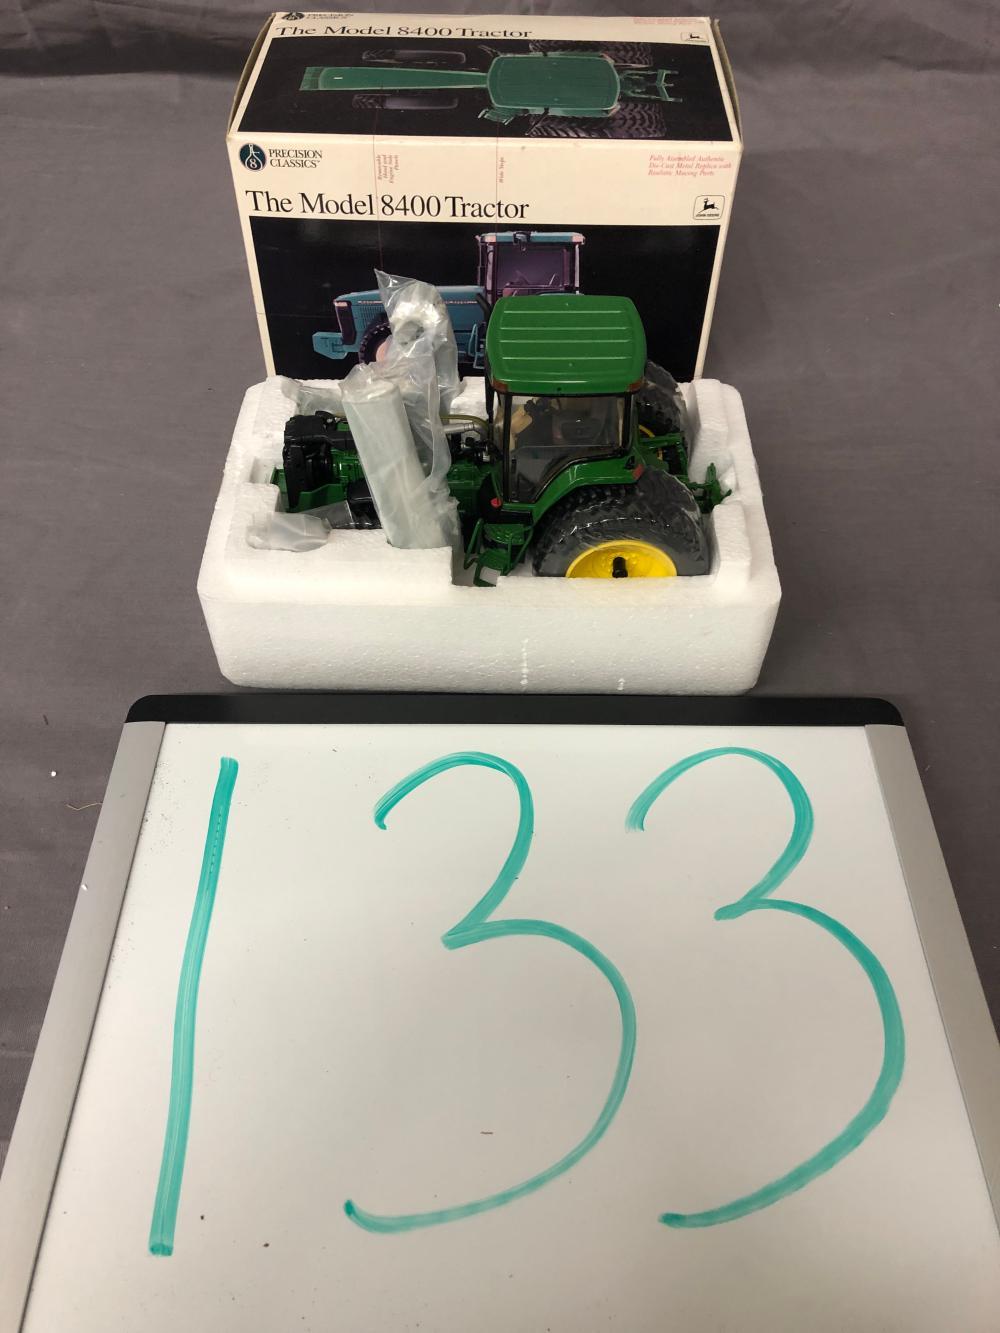 1/32nd Scale Precision John Deere 8400